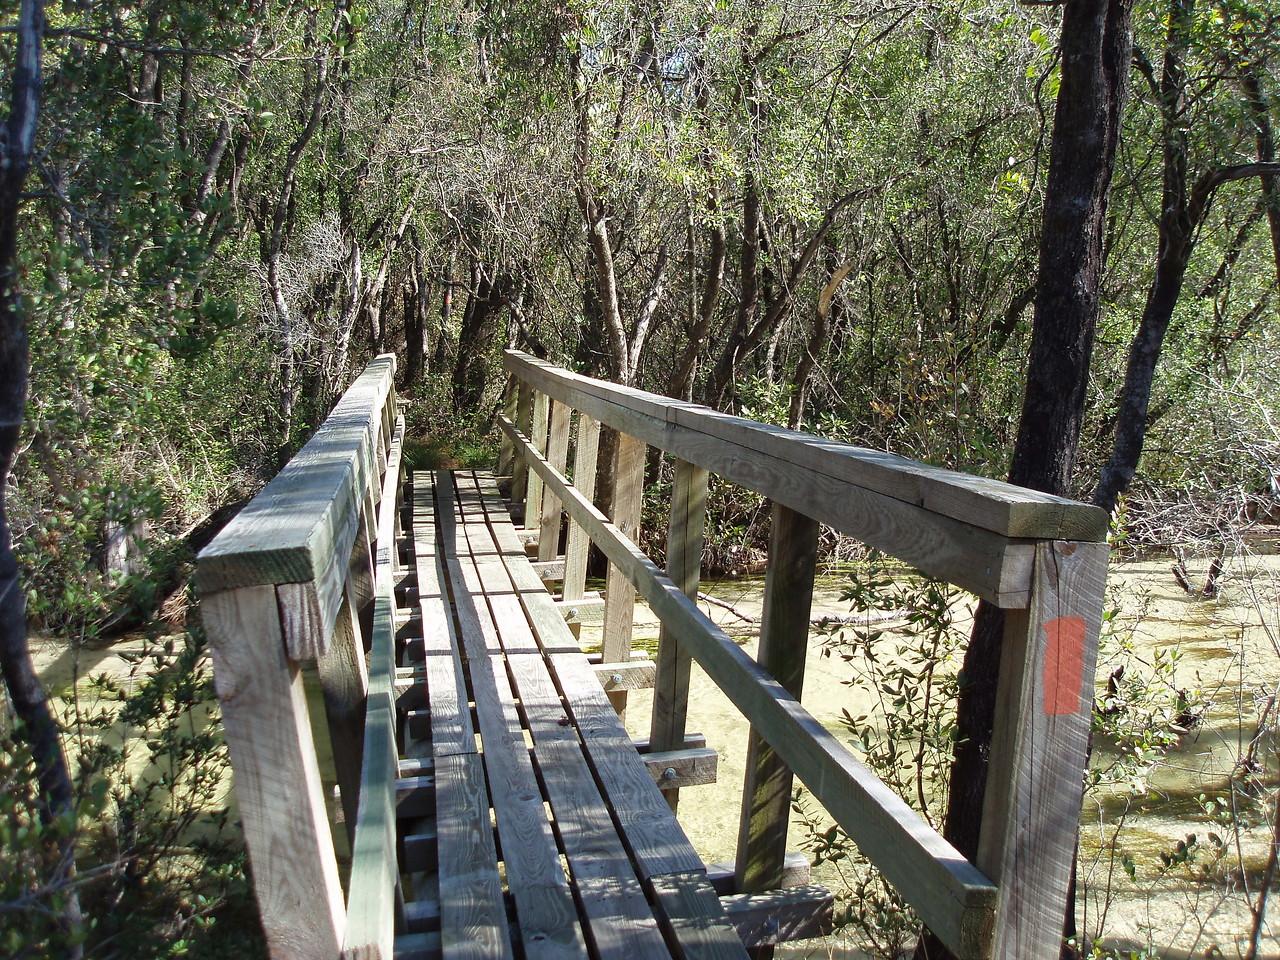 Florida Trail bridge crossing, Eglin AFB<br /> PHOTO CREDIT: Robert Coveney / Florida Trail Association